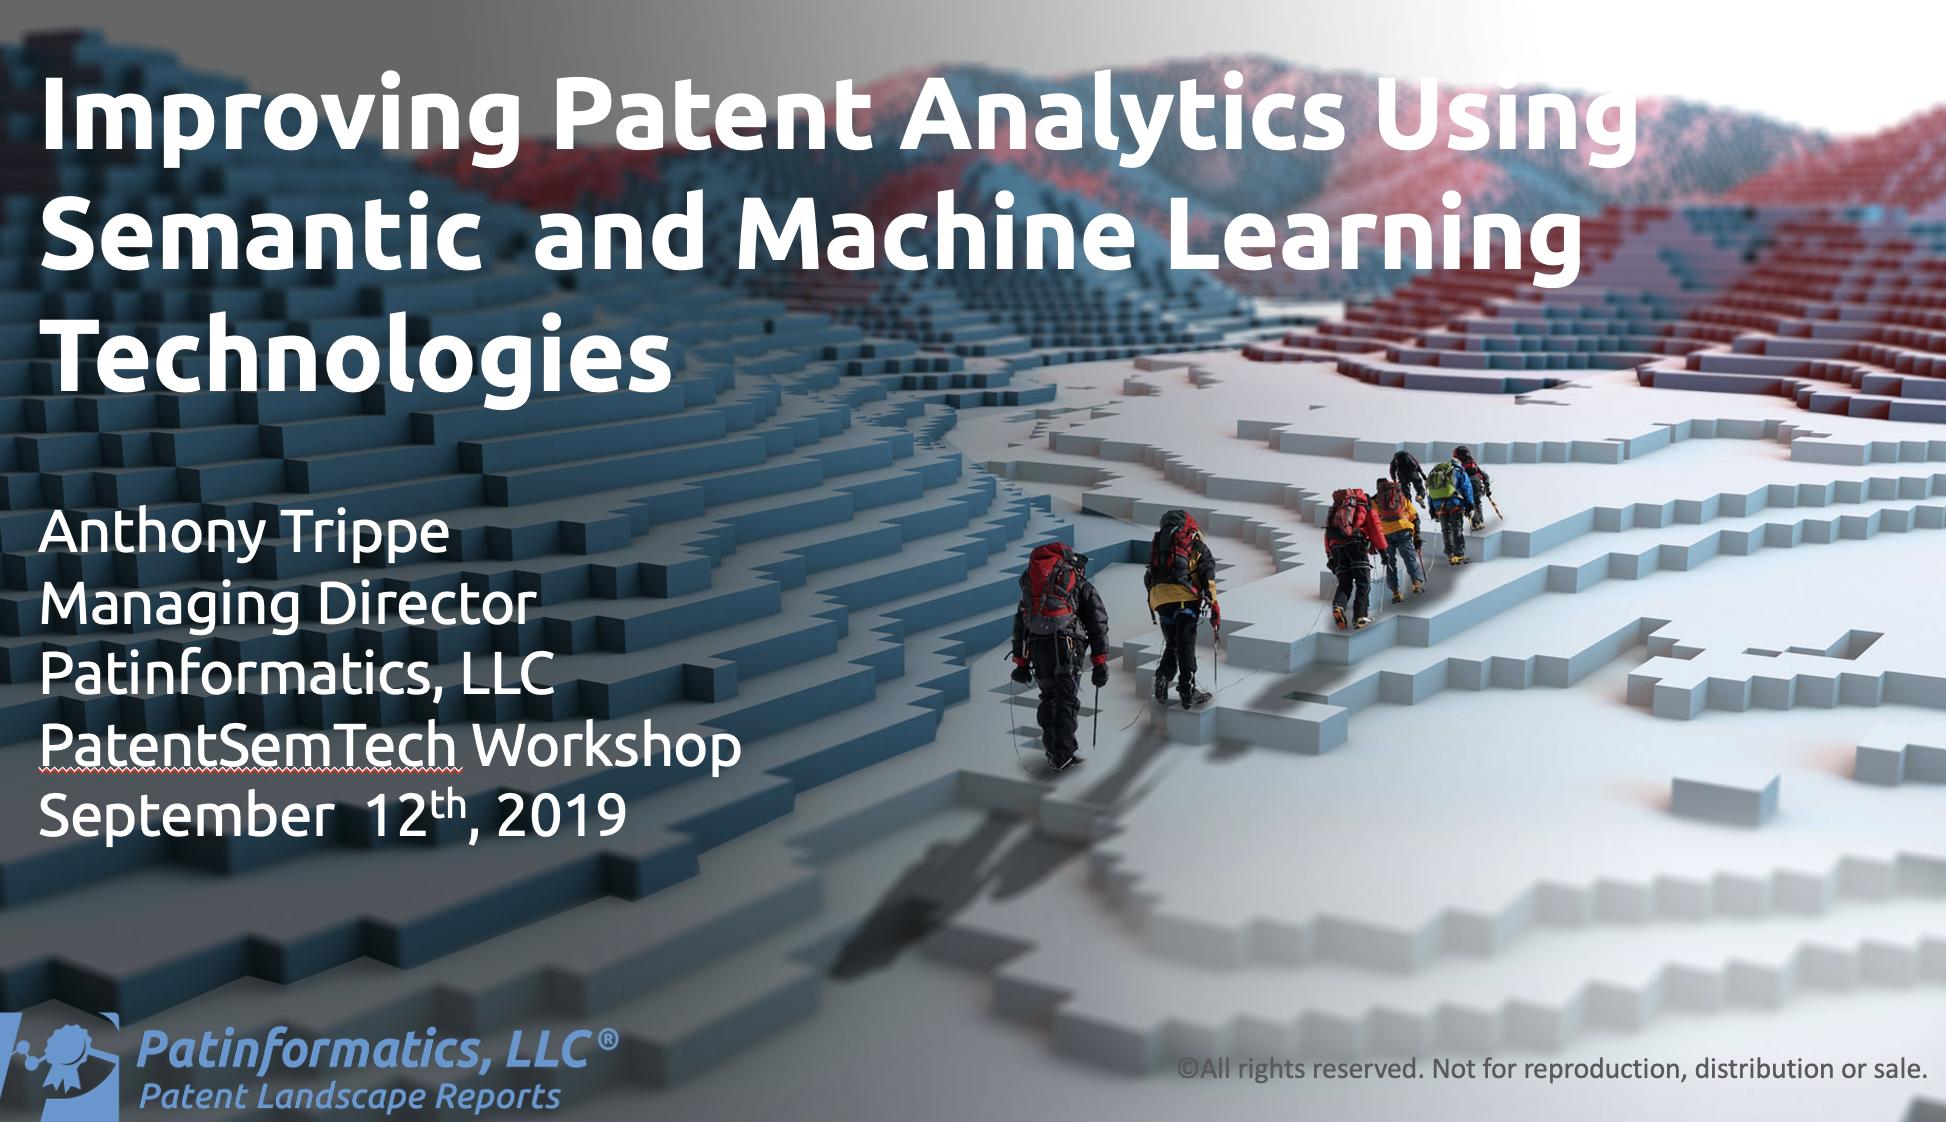 Improving Patent Analytics Using Semantic and Machine Learning Technologies